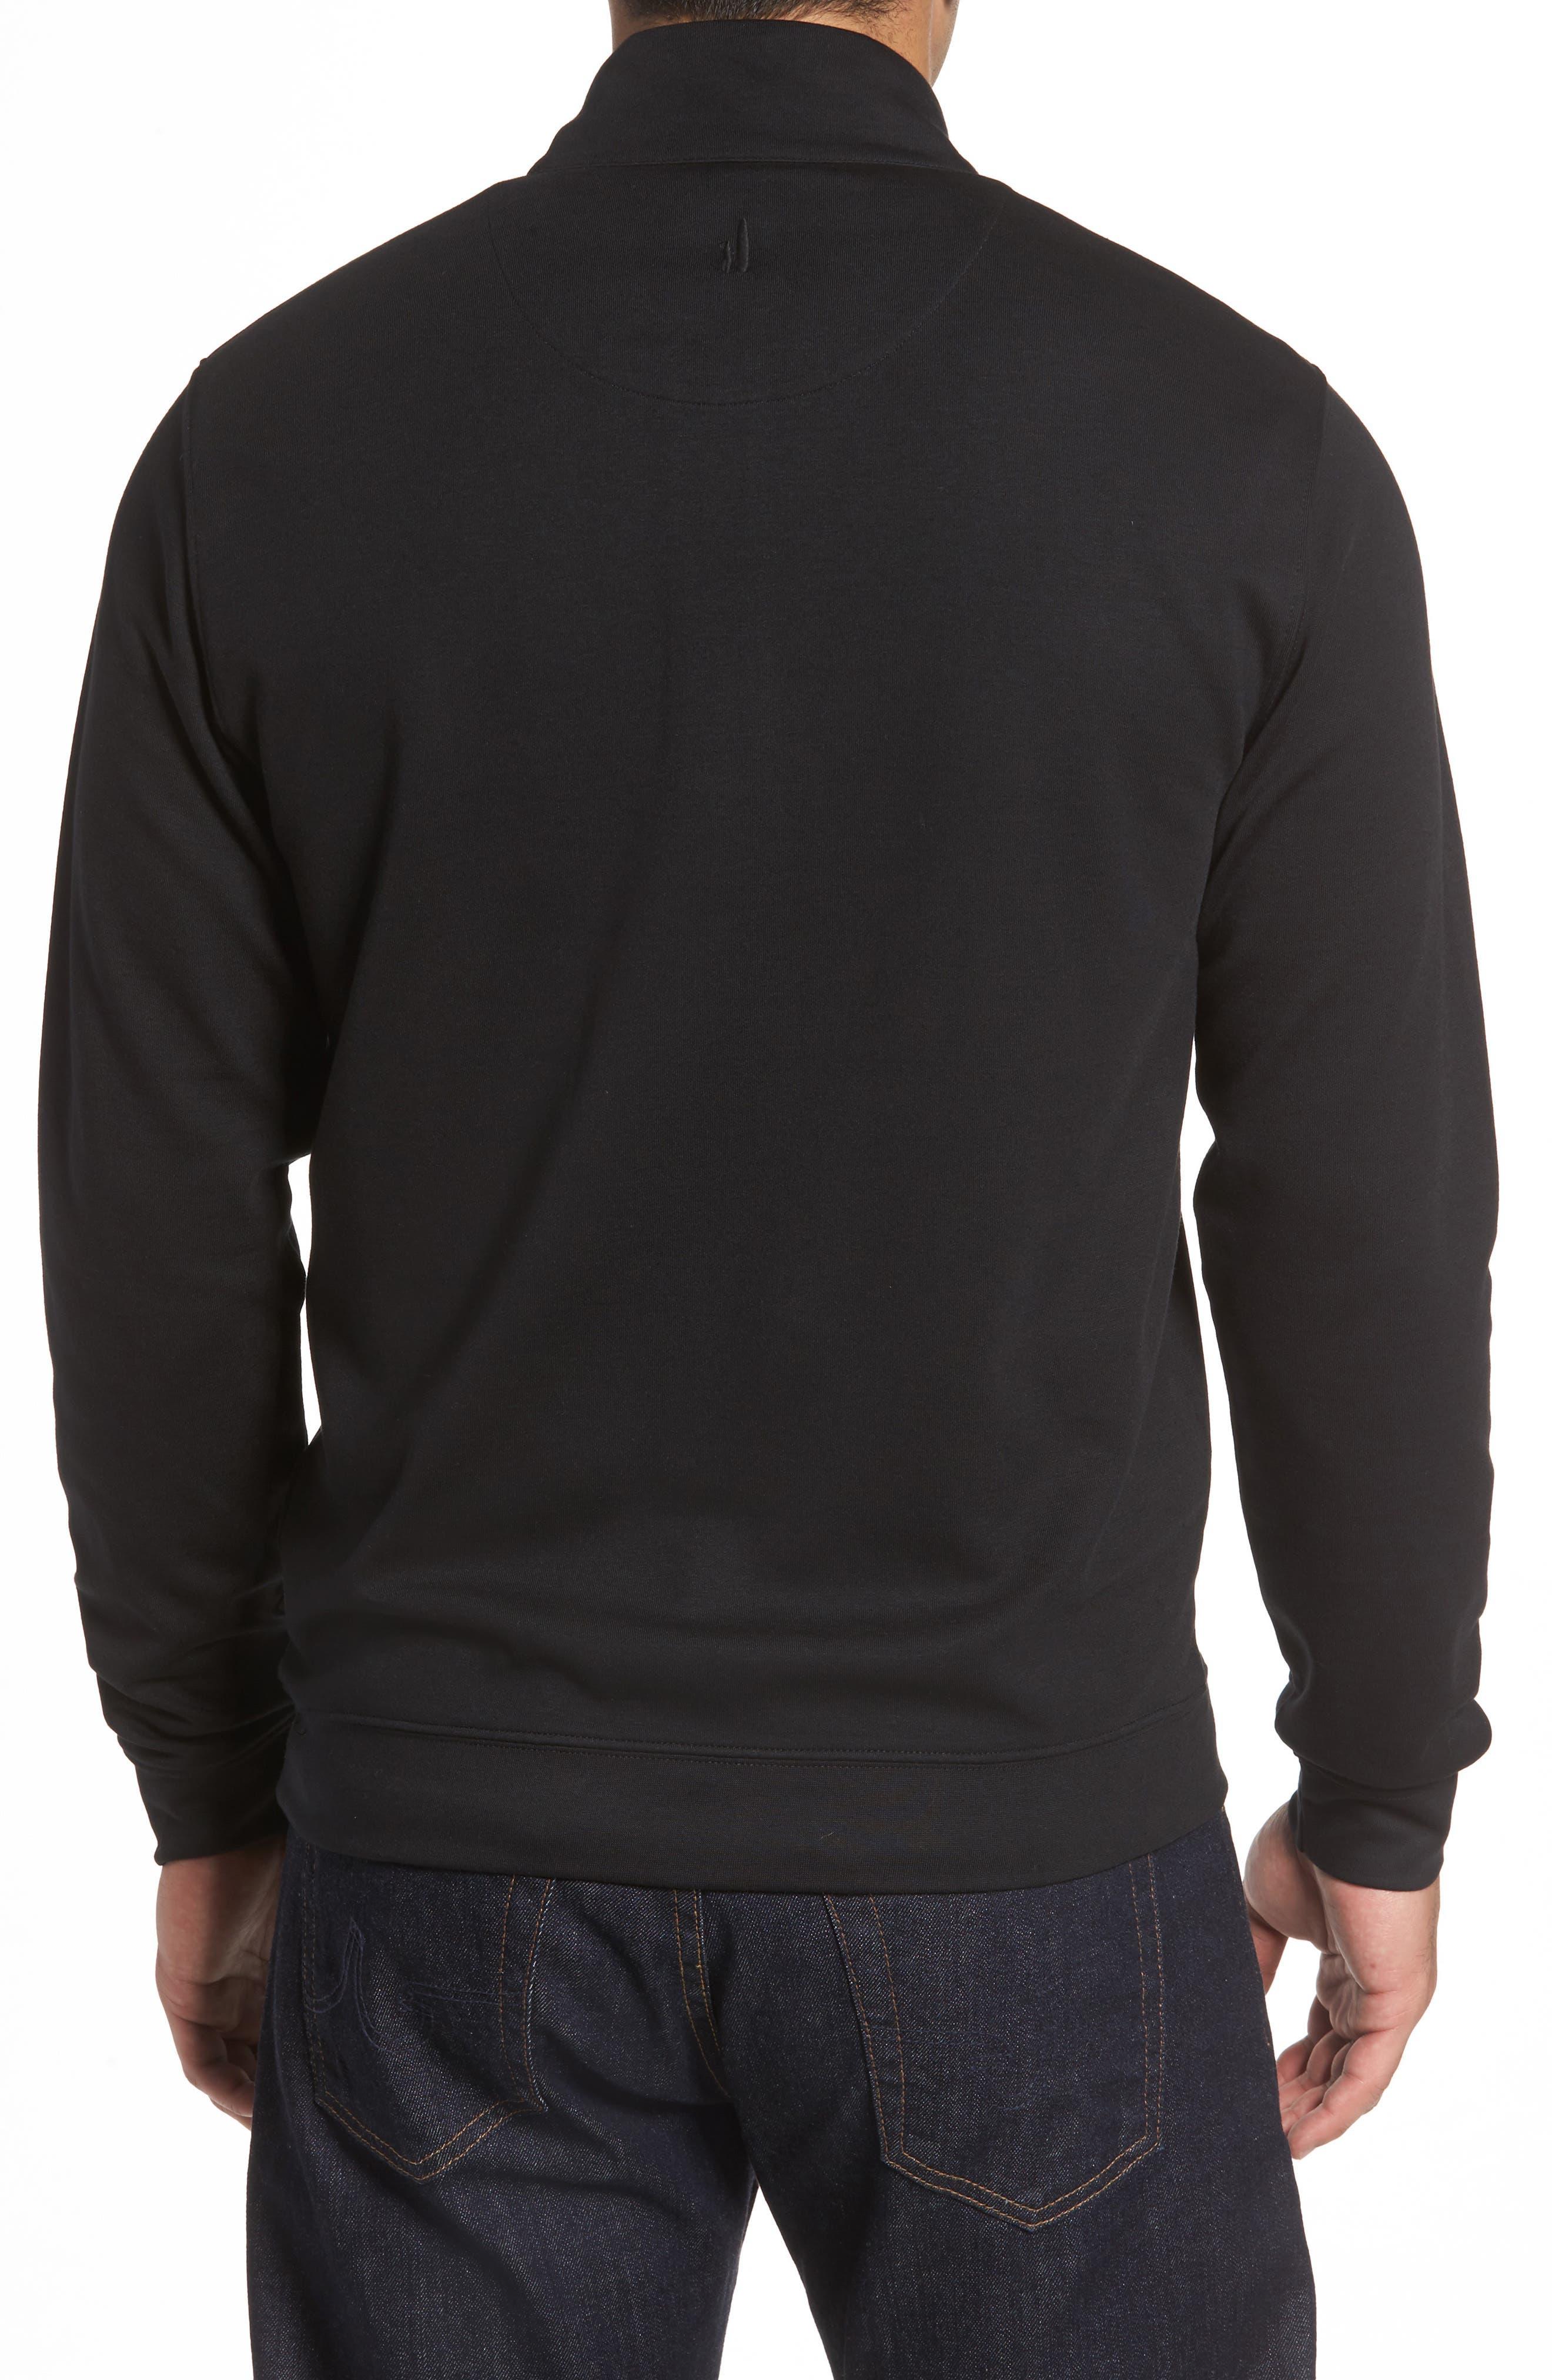 Sully Quarter Zip Pullover,                             Alternate thumbnail 2, color,                             BLACK